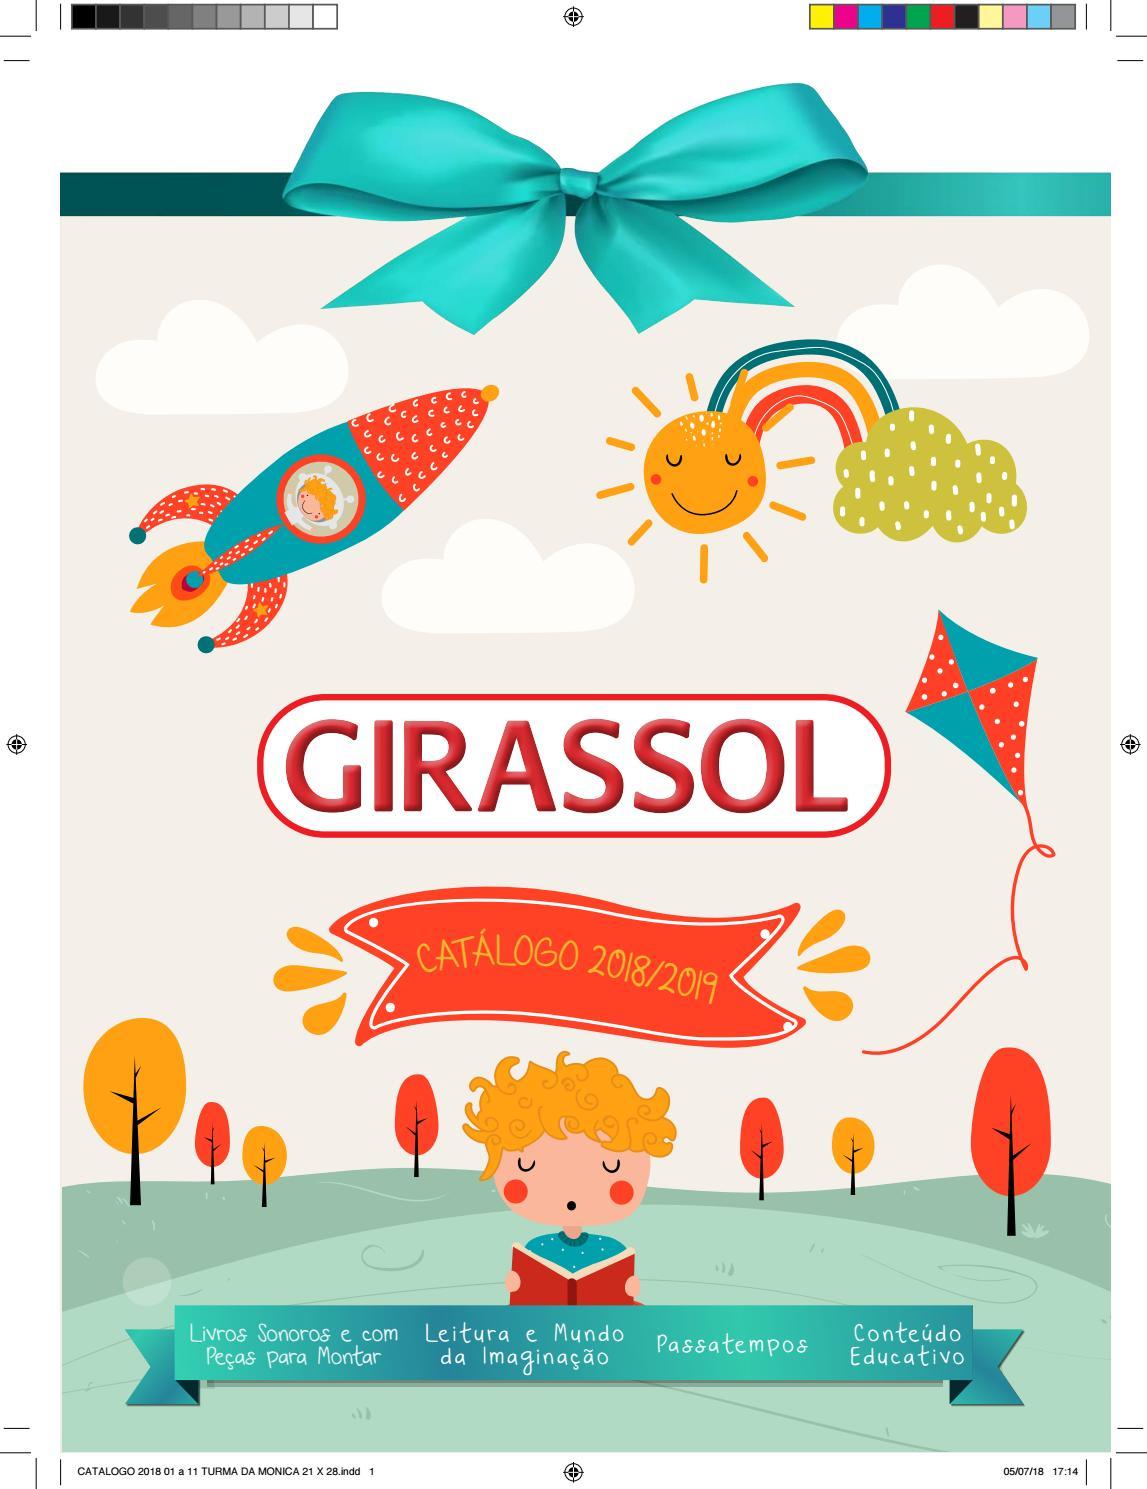 298d2e168 Girassol Brasil - catálogo 2018/2019 by Editora Girassol Brasil - issuu